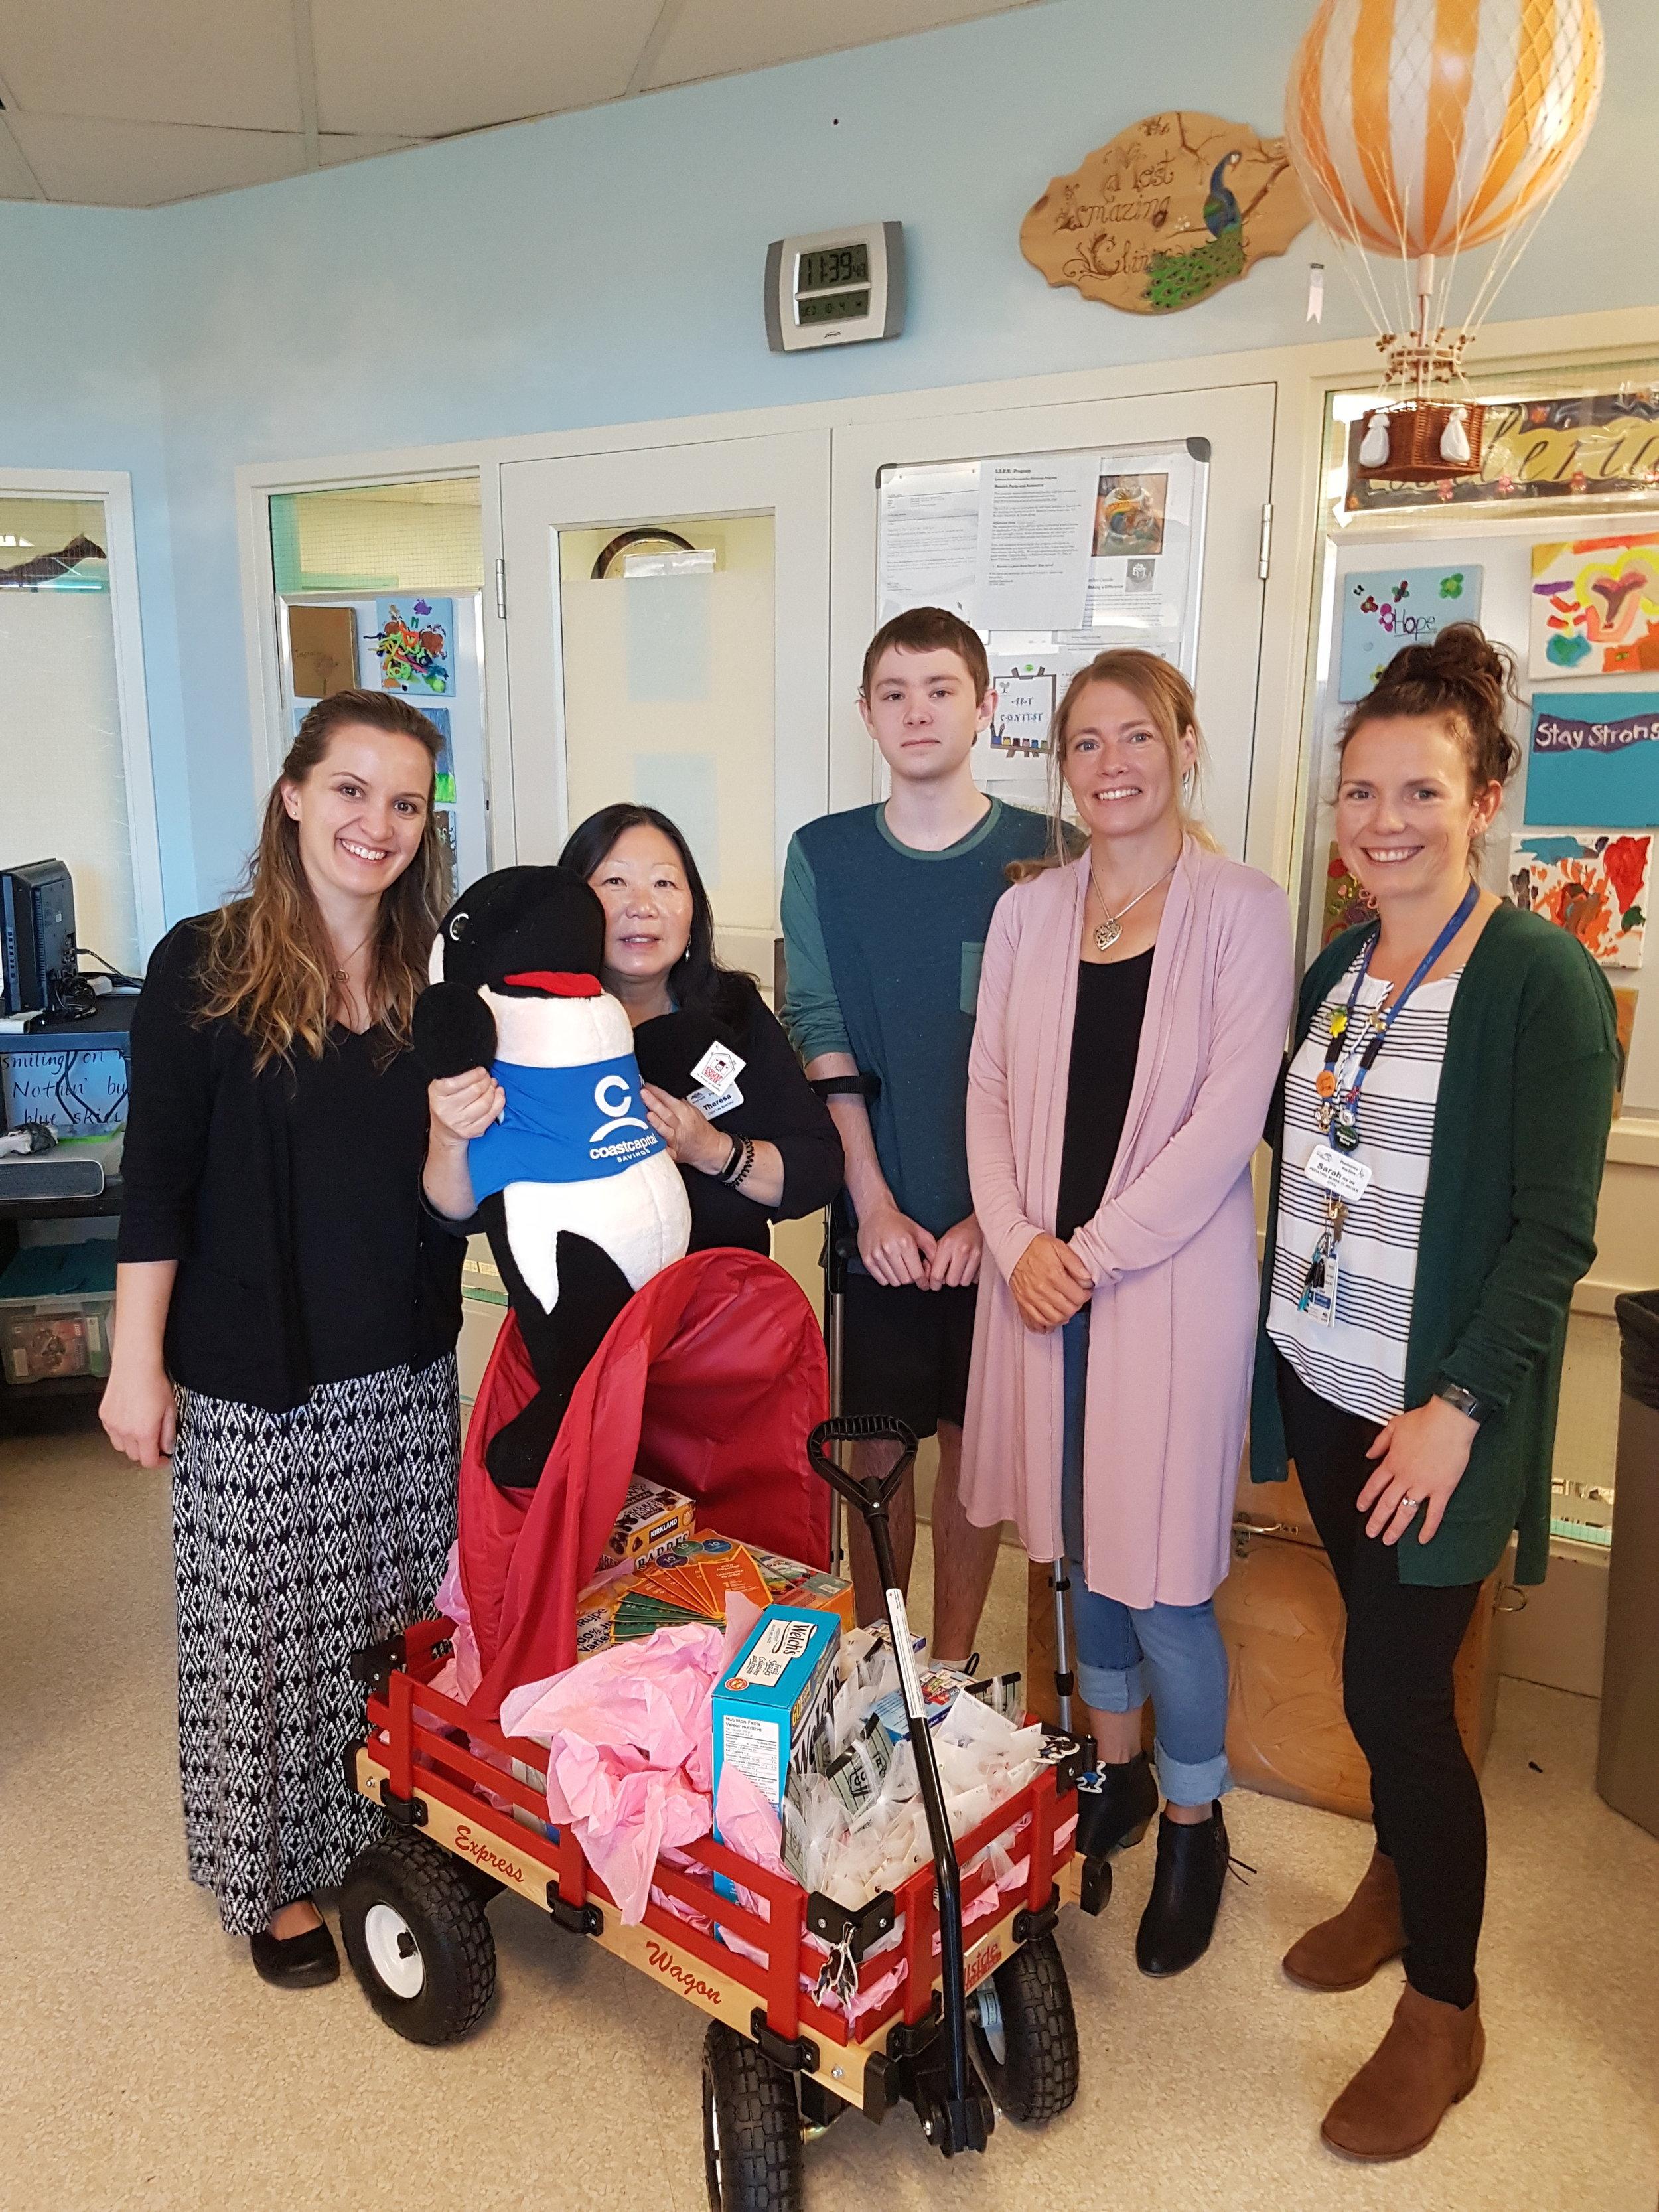 From left to right: Dr. Ewa Lunaczek-Motyka (Pediatric Oncologist), Theresa Low (Child Life Specialist), Jacob Kerr (Super Hero), Susan Kerr (CARE 4 Kids Program Coordinator), Sarah Fitton (Pediatric Oncology Nurse Clinician)